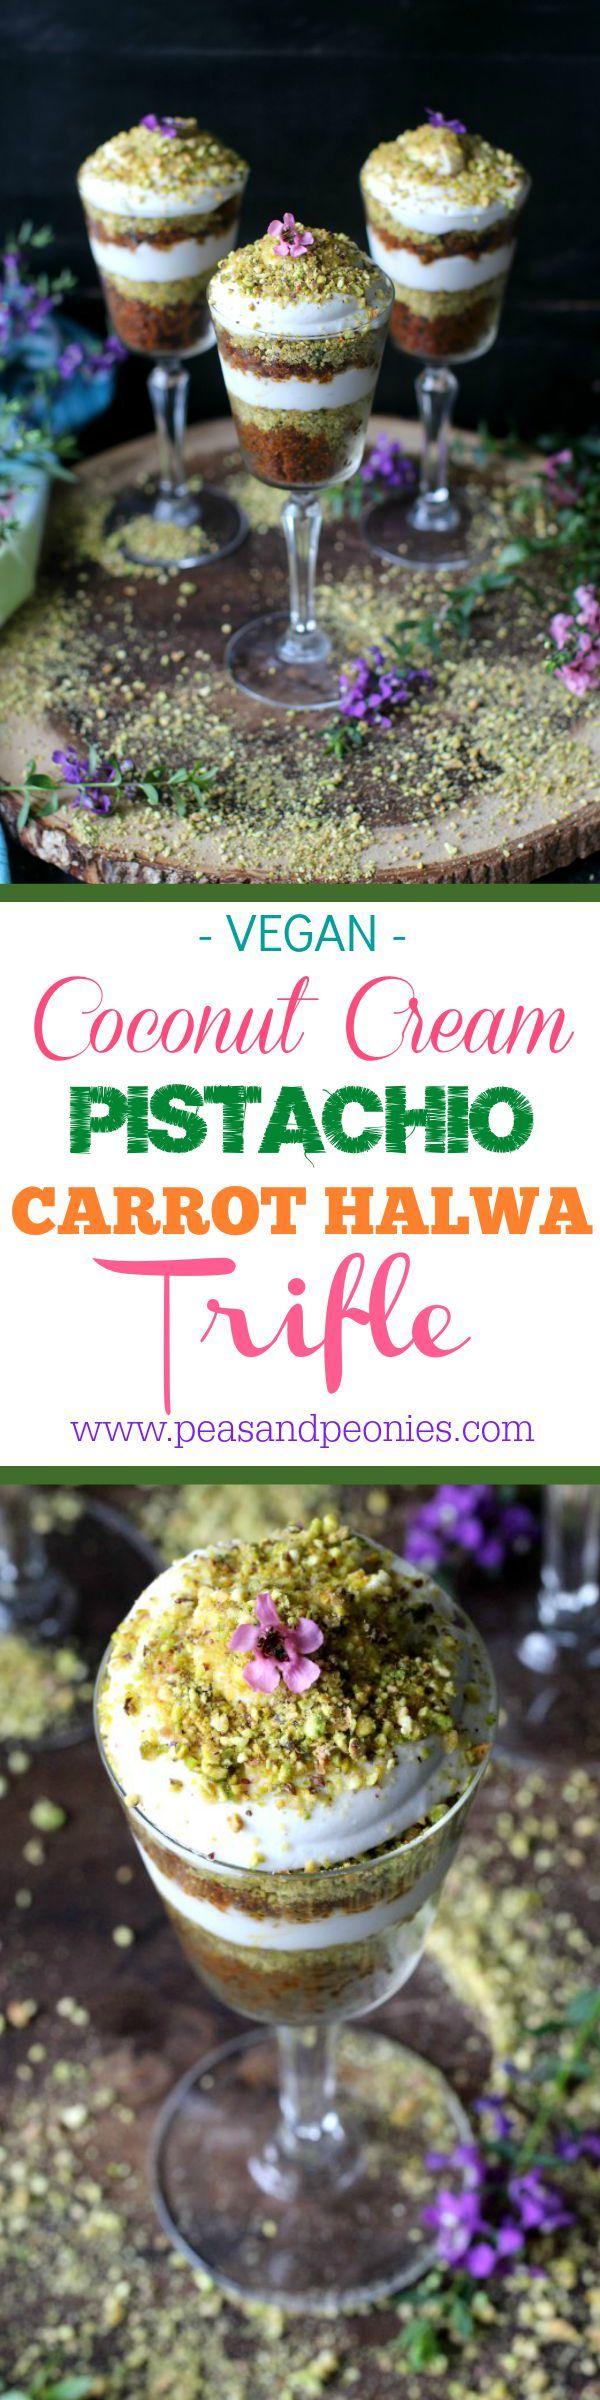 Vegan Carrot Halwa Coconut Cream Pistachio Trifle - Peas and Peonies